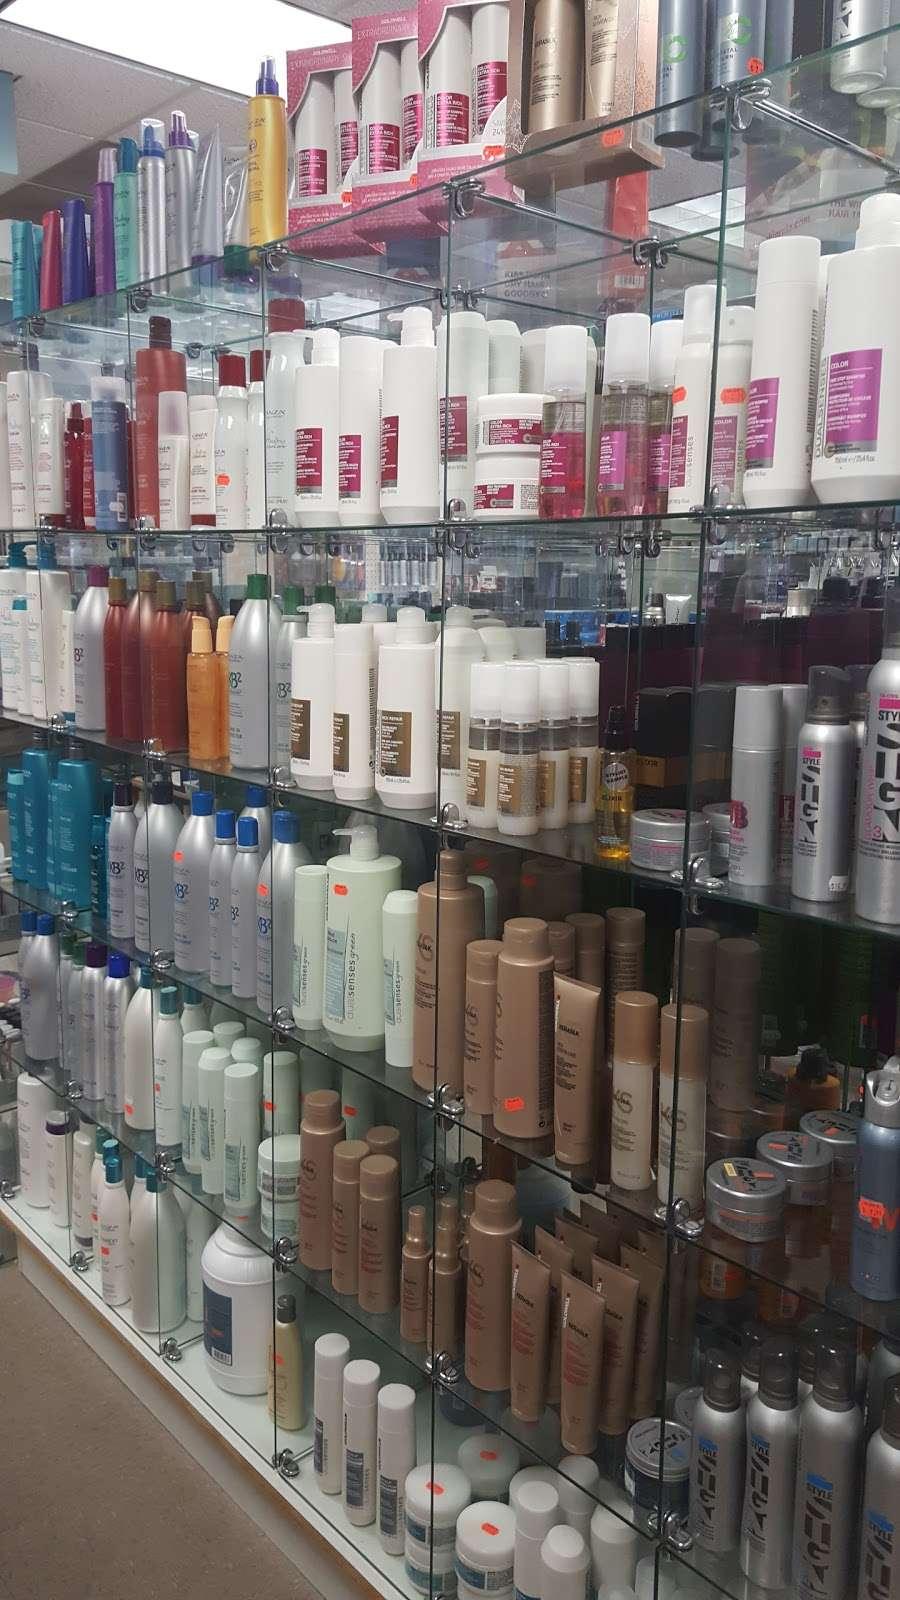 Helens Beauty Supply & Salon - hair care  | Photo 7 of 9 | Address: 15760 La Forge St, Whittier, CA 90603, USA | Phone: (562) 943-7313